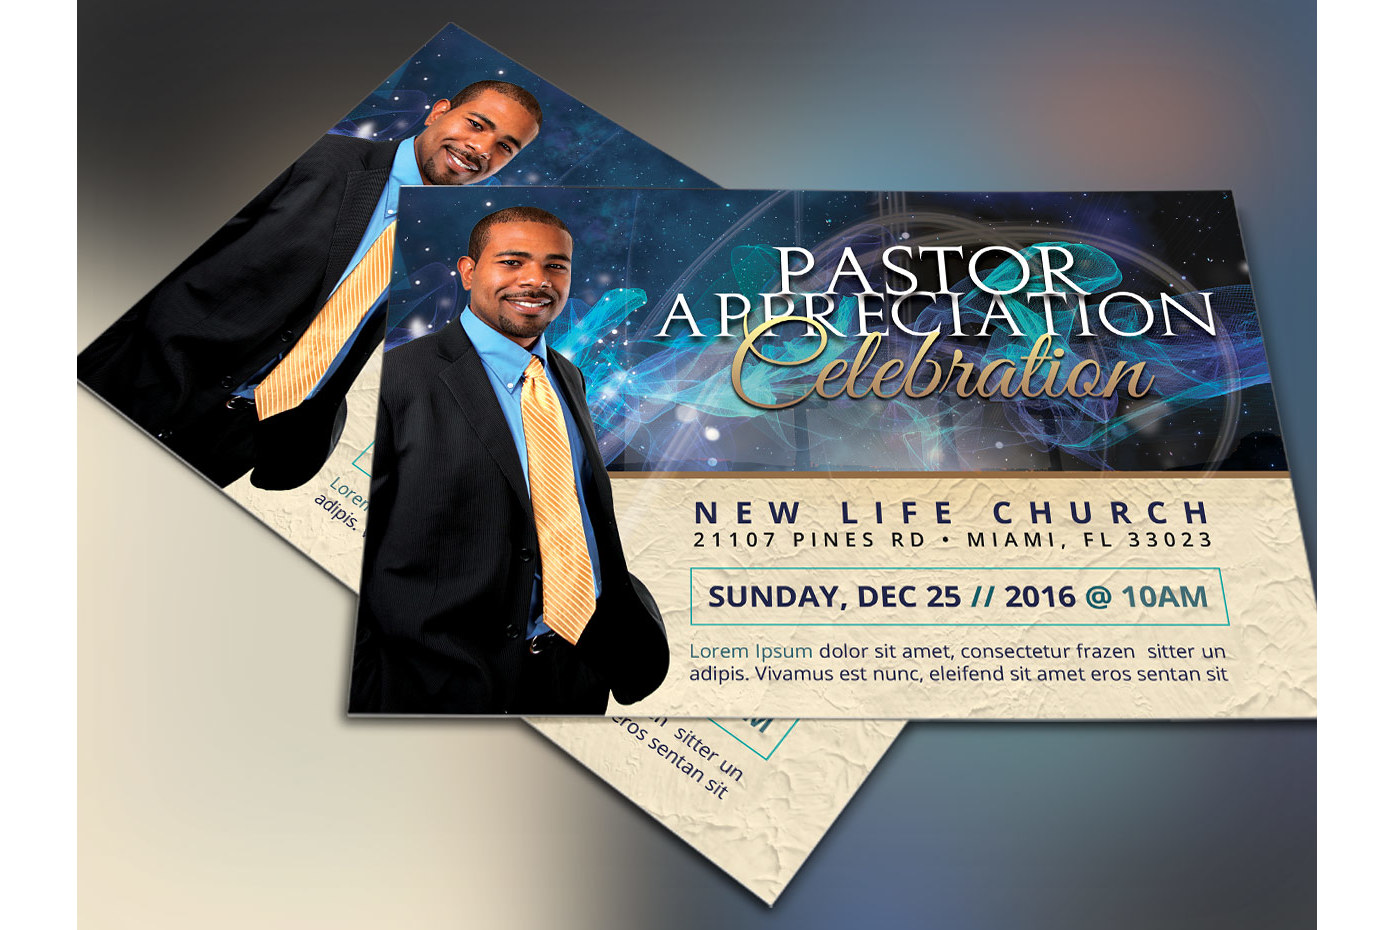 Starlight Pastor Anniversary Flyer Template Vol. 3  example image 1